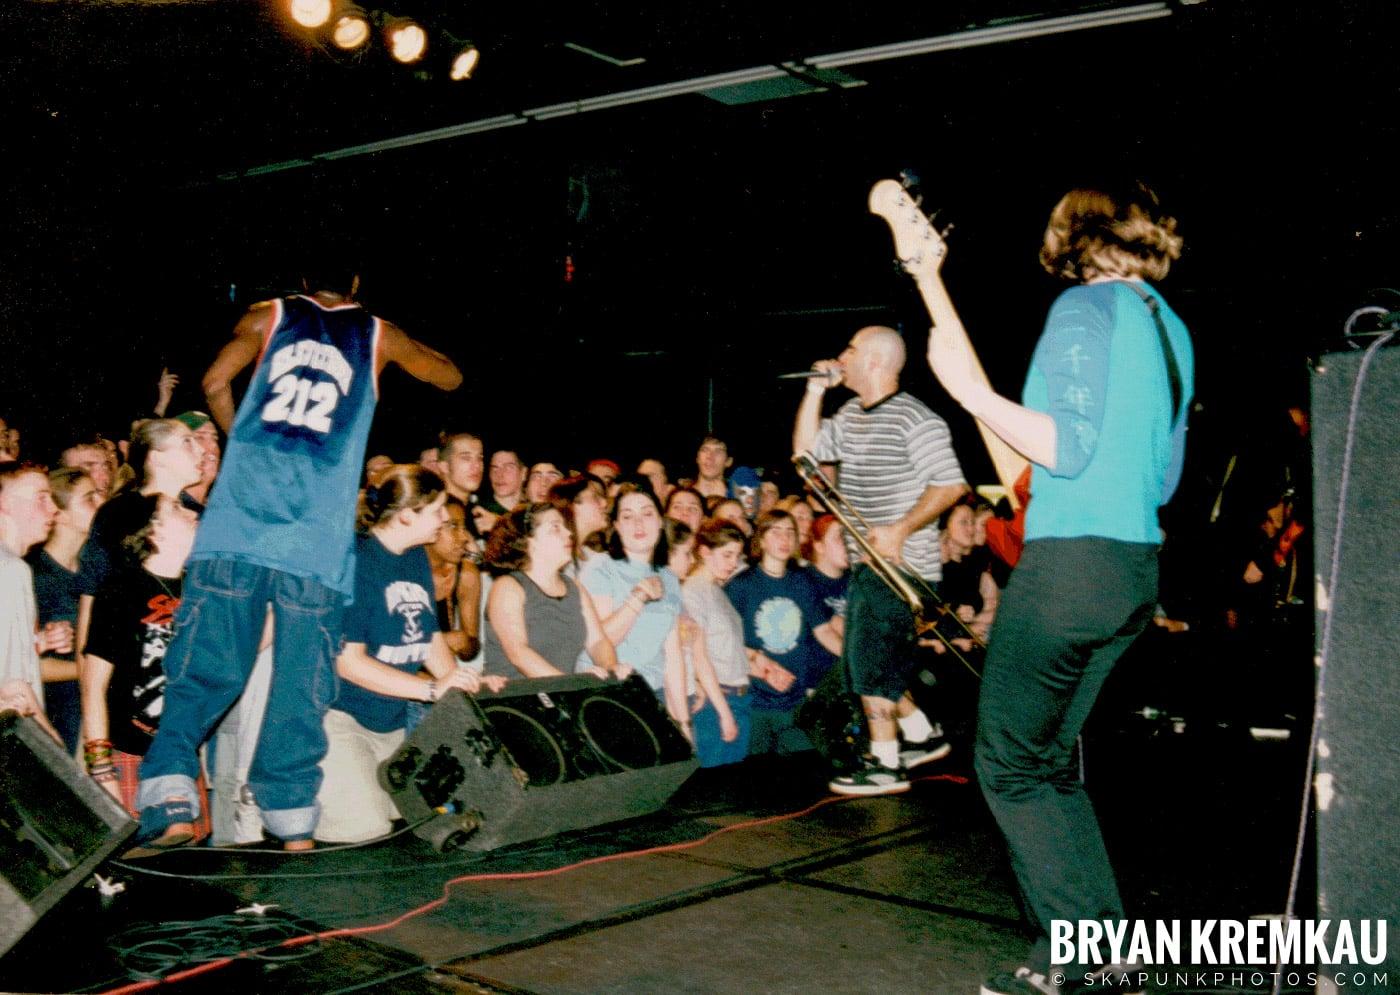 Pilfers @ Skater's World, Wayne, NJ - 1998 (8)